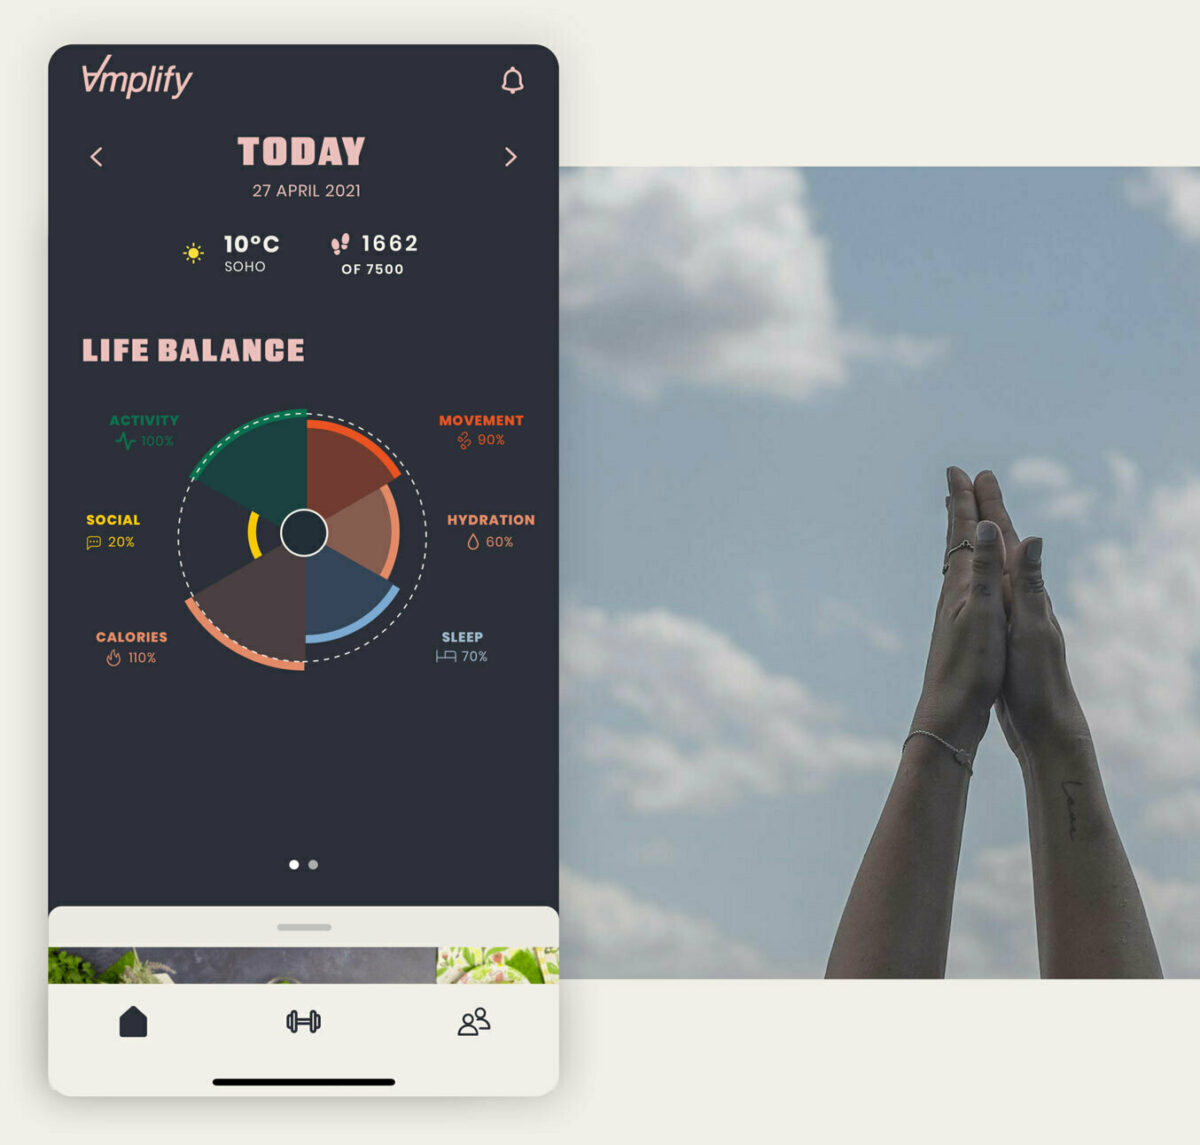 Amplify Life Balance App screen